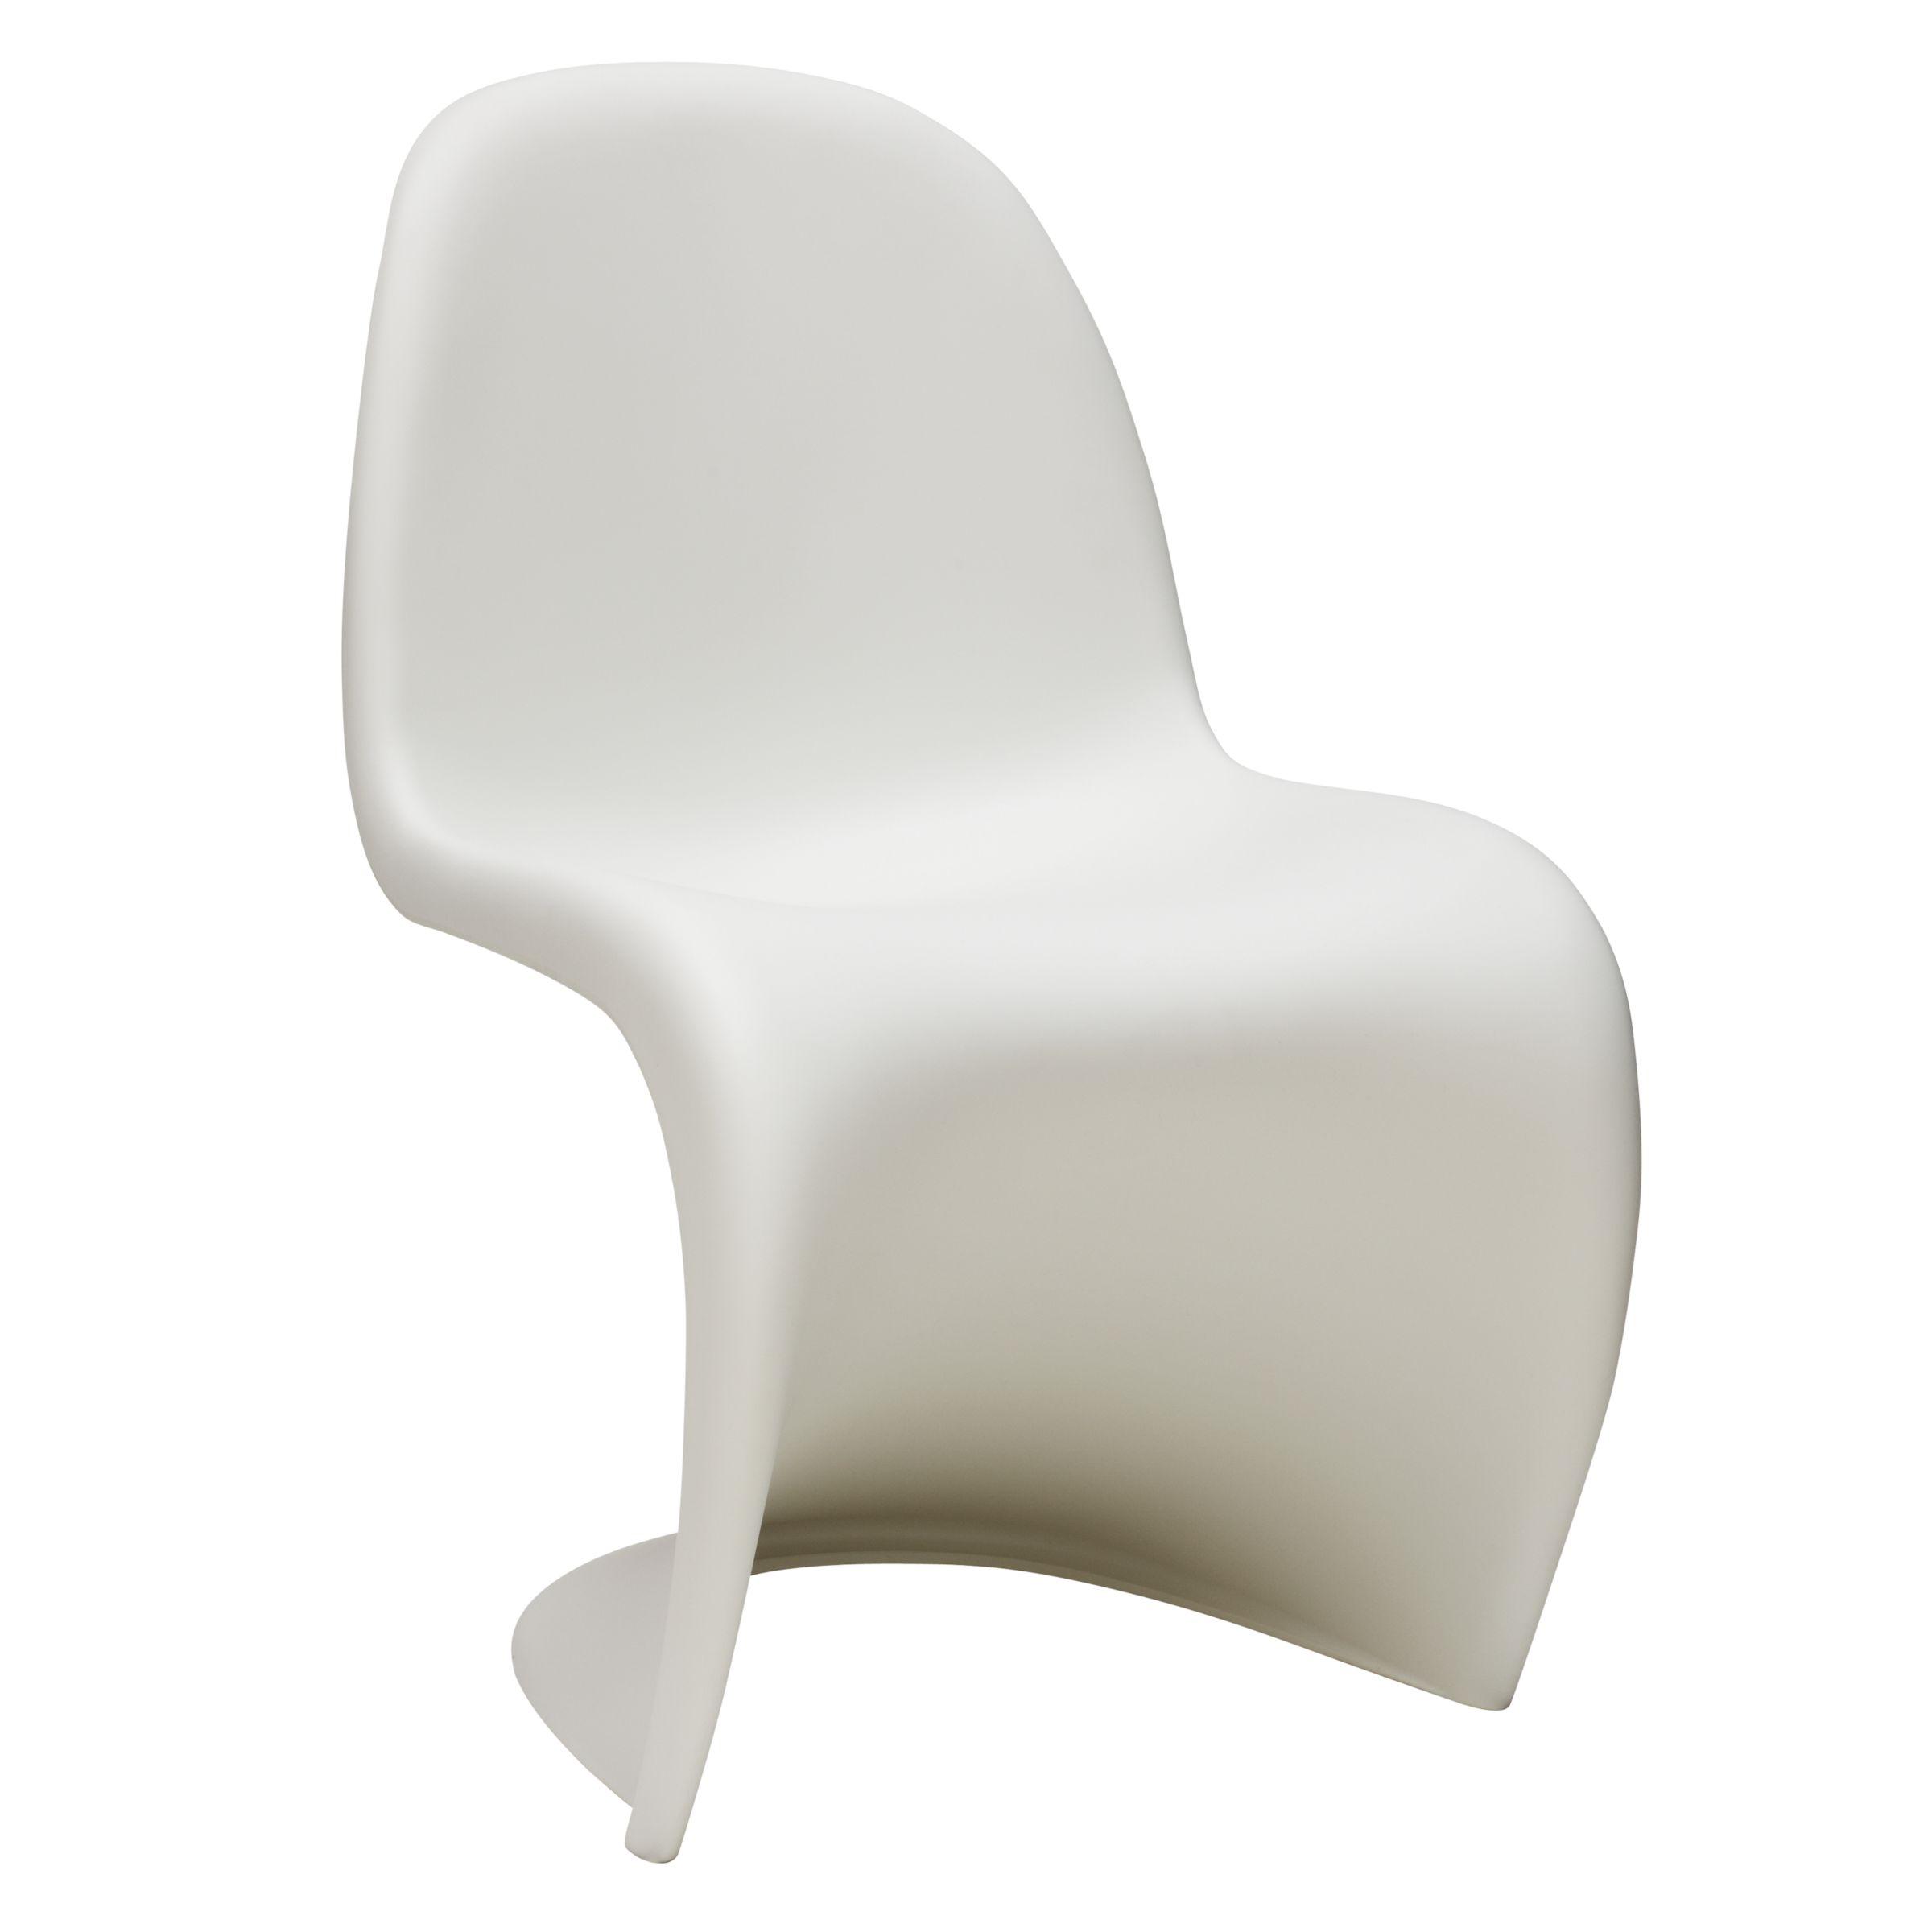 panton s chair graco high cover uk vitra white at john lewis partners buyvitra online johnlewis com